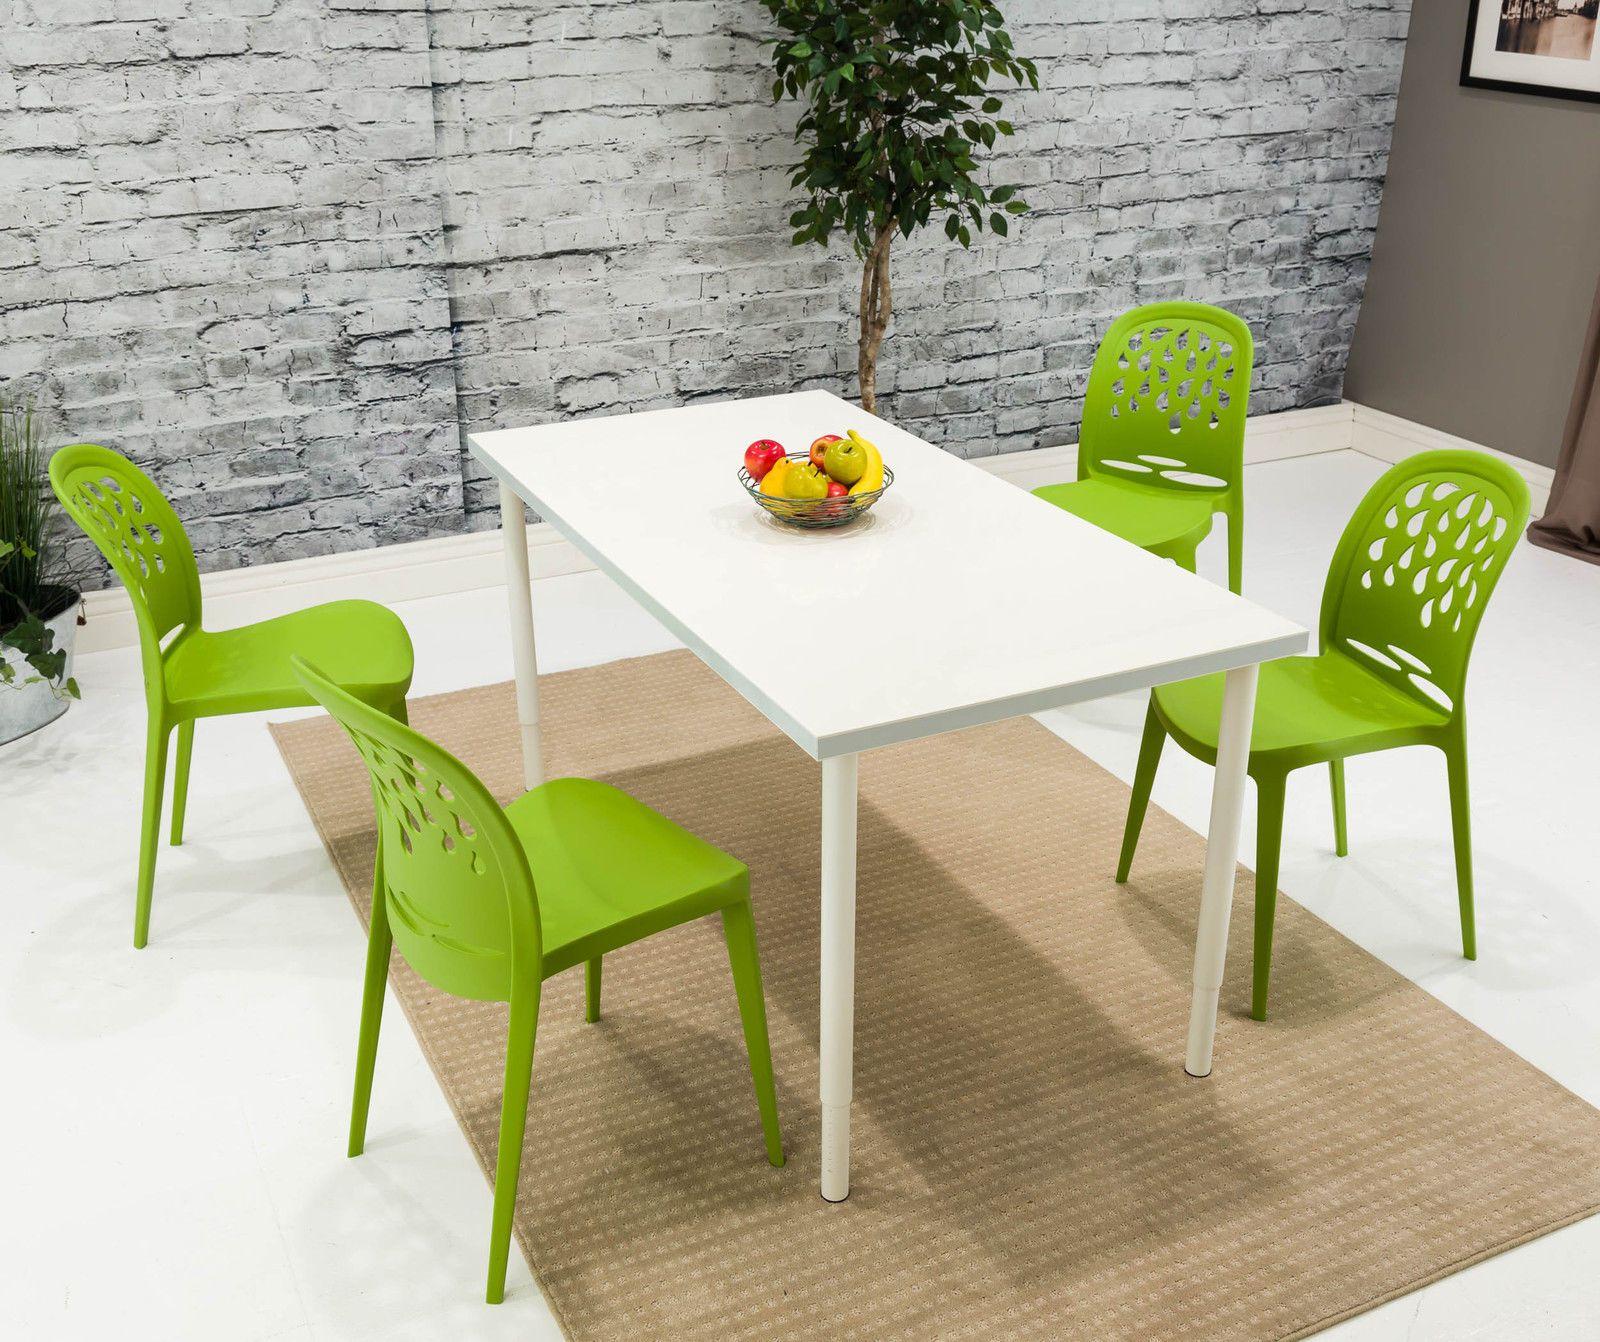 Atomic green retro mid century modern style teardrop dining chair